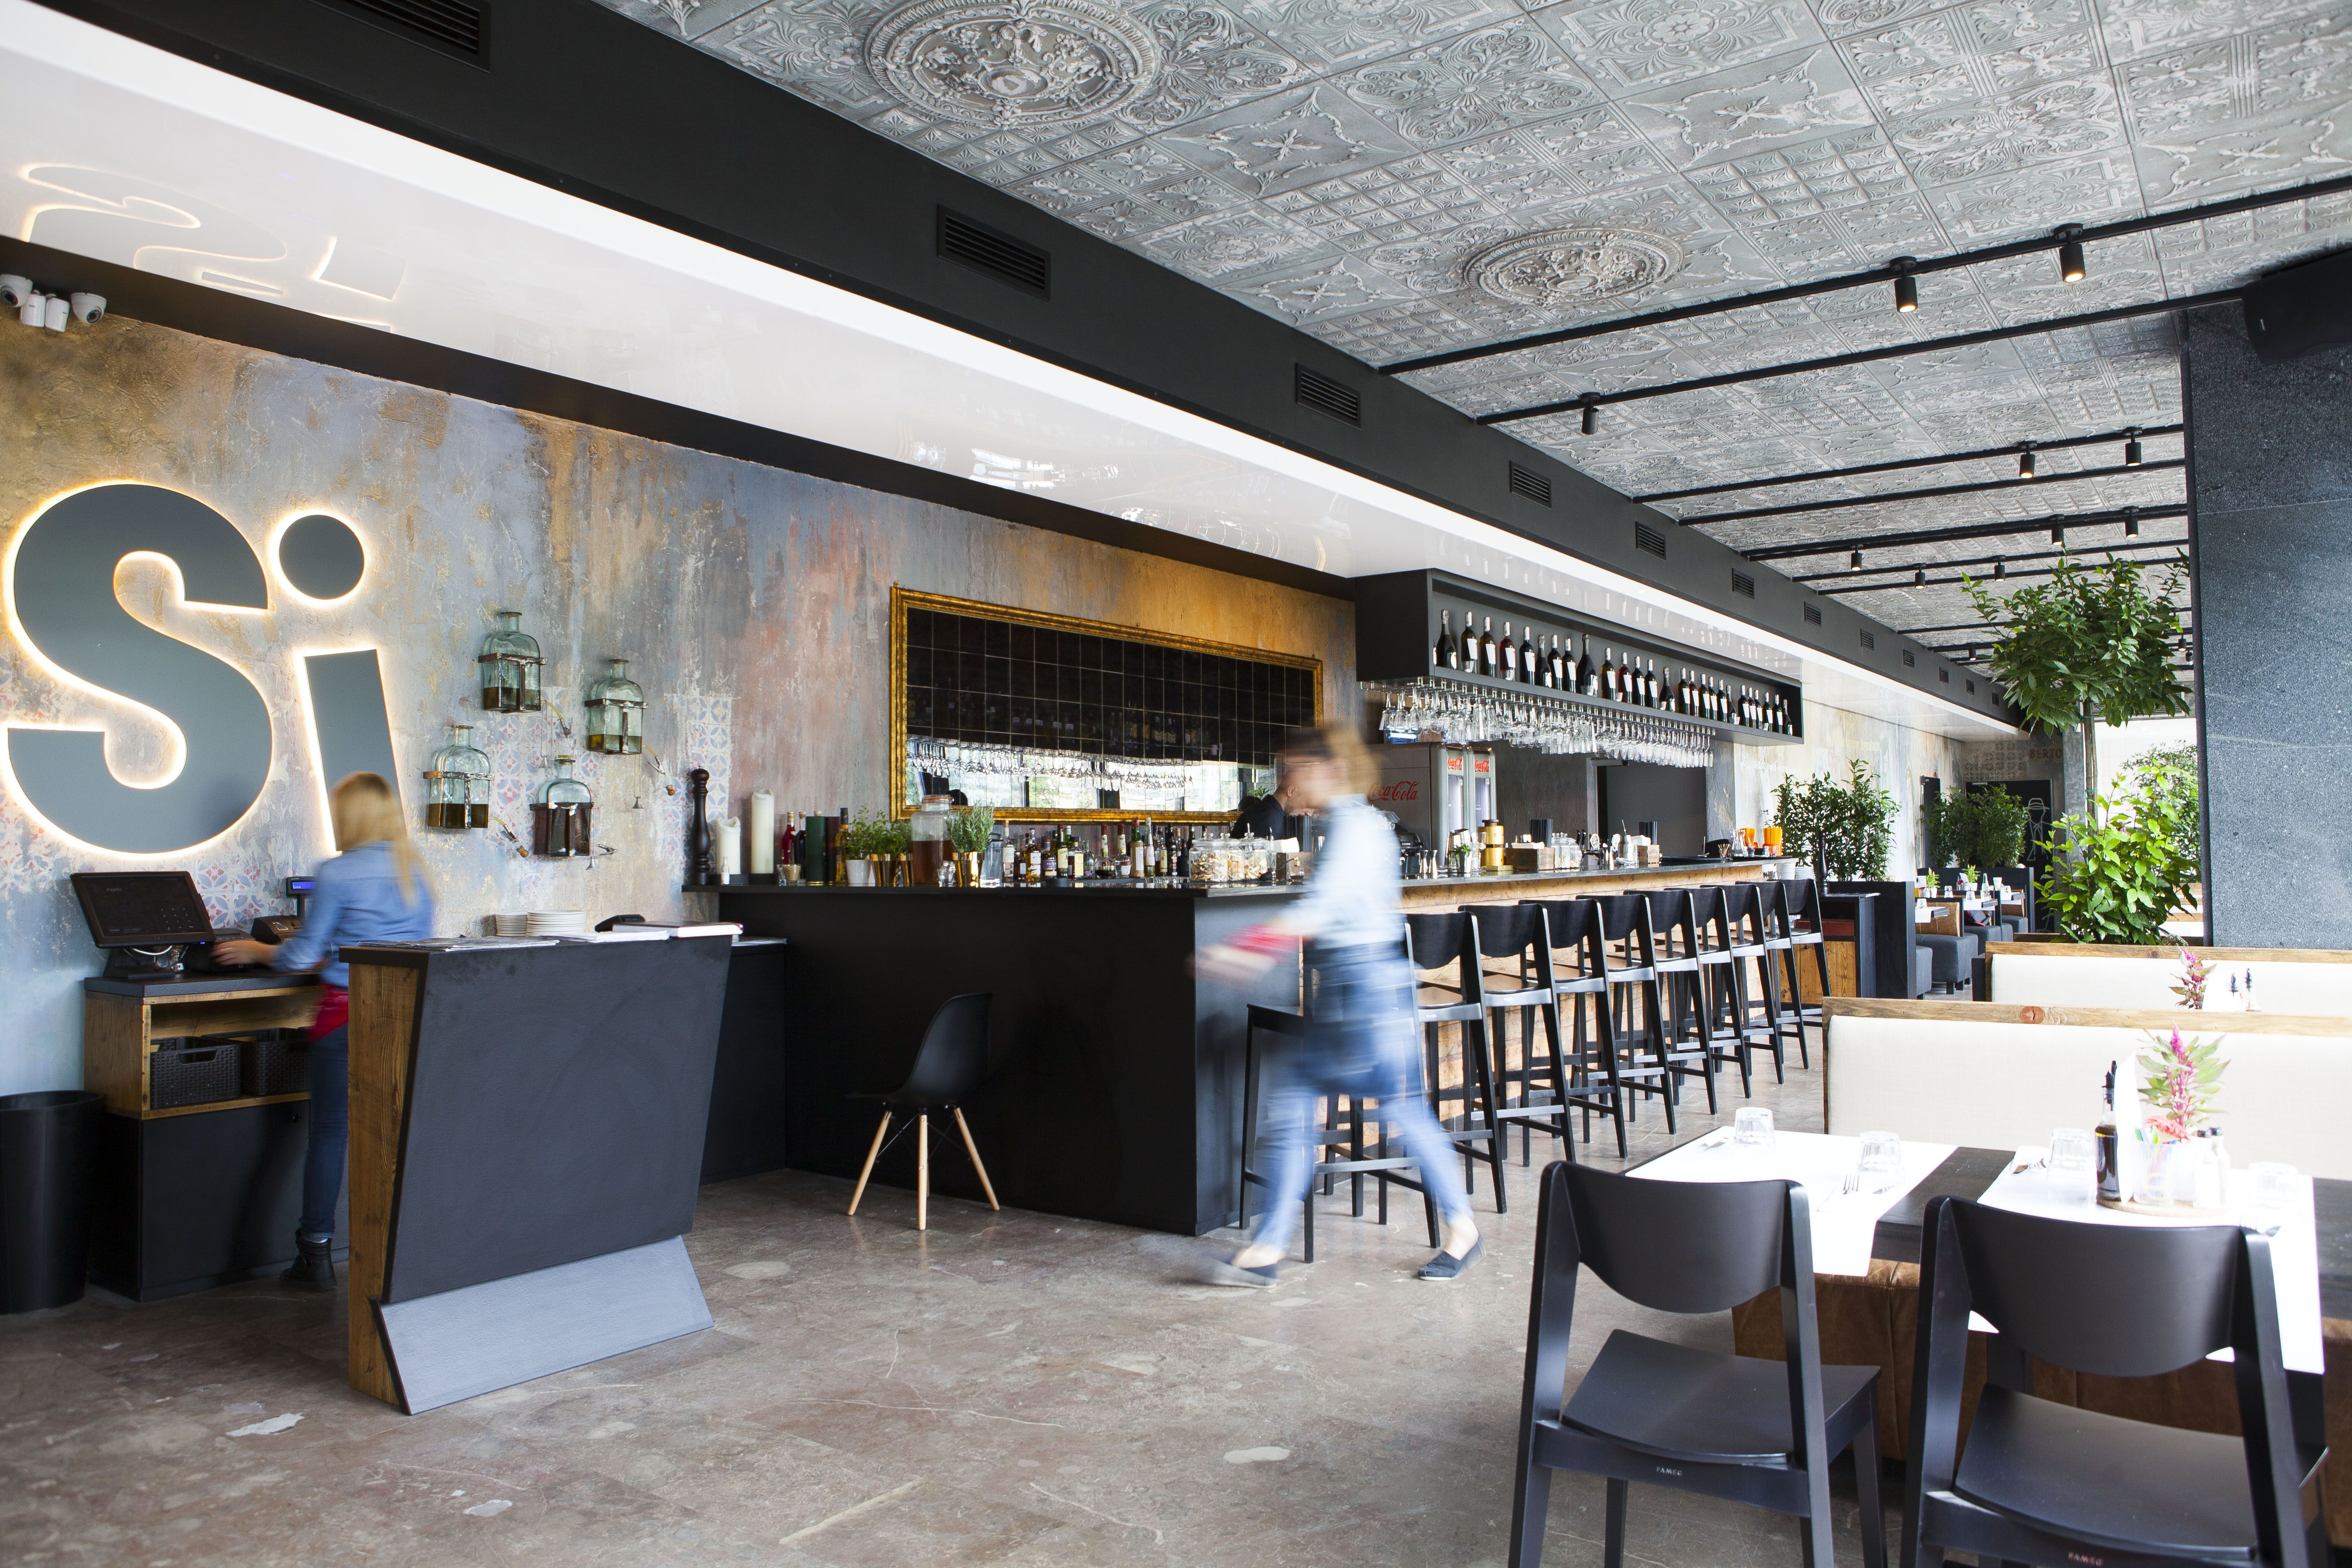 Restauracja Si Si Ristorante Amp Coctail Bar Si Restauracje Warszawa Restauracja Plac Bankowy Wloska Re Conference Room Conference Room Table Home Decor